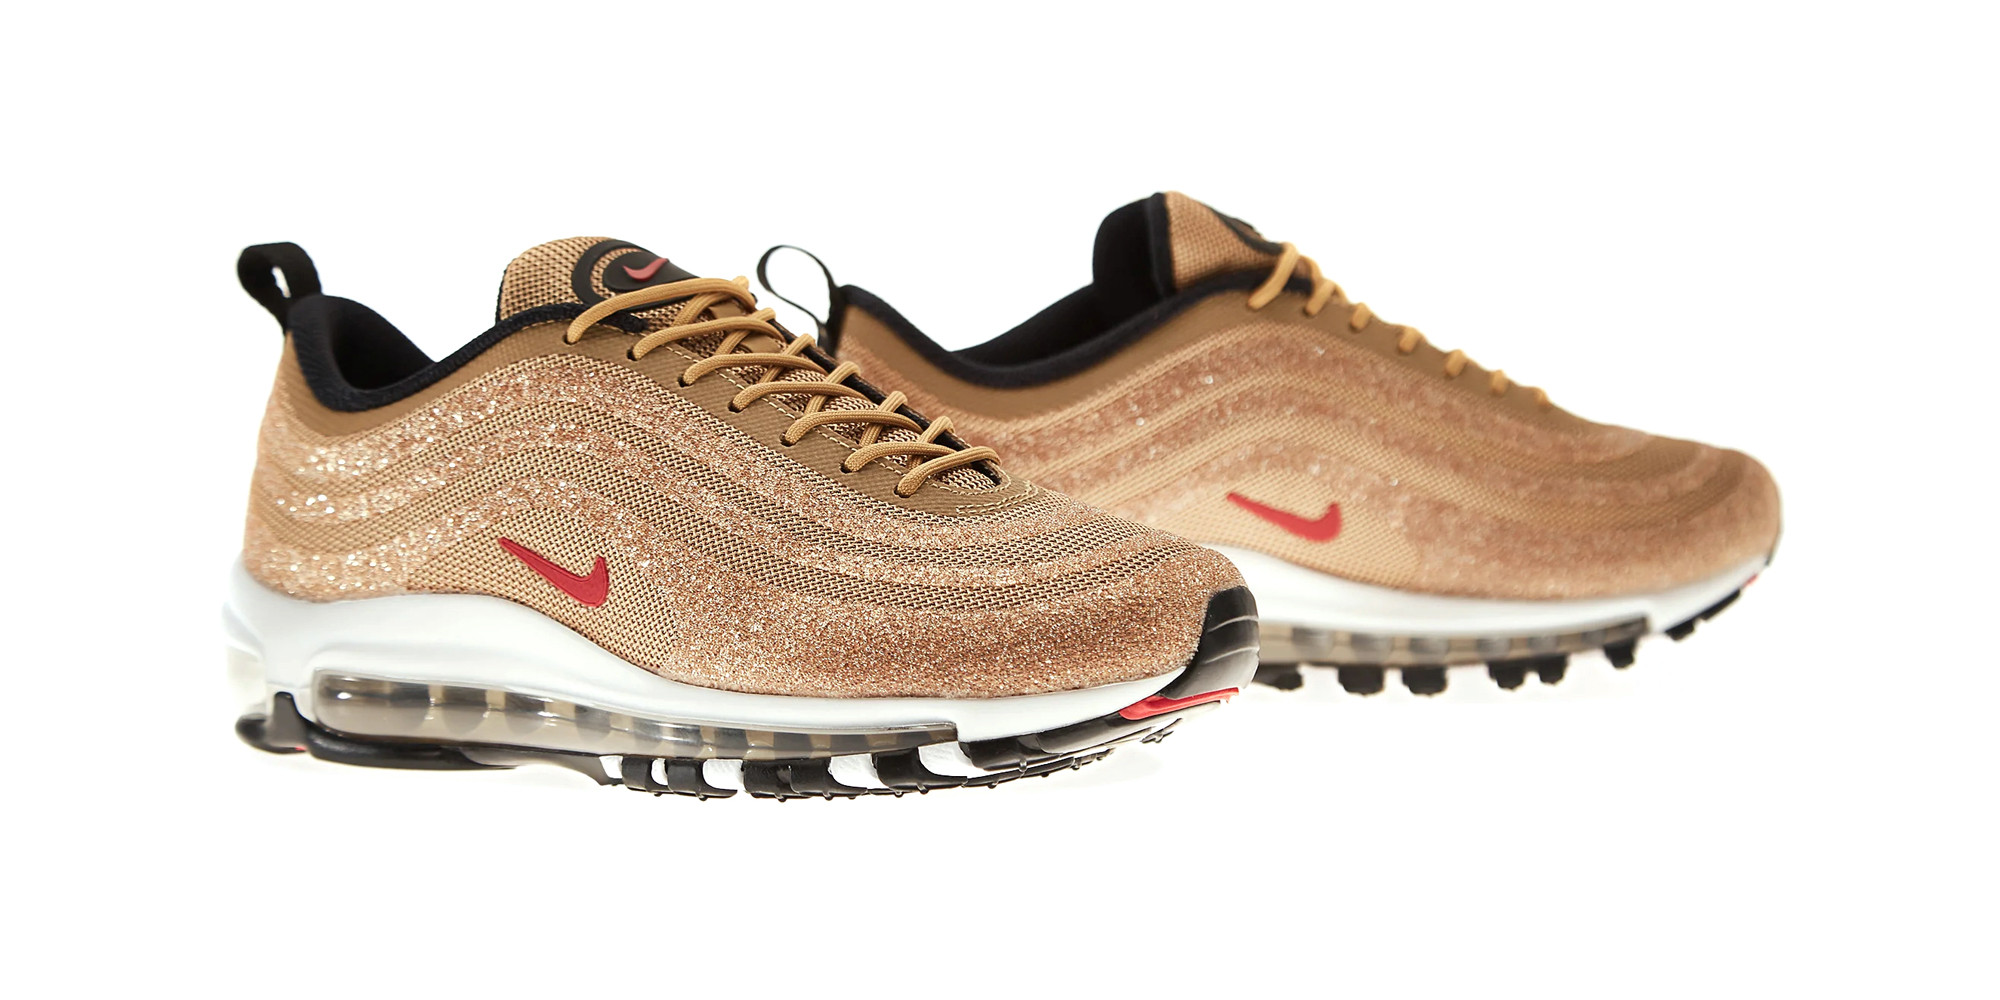 Nike Air Max 97 Swarovski Metallic Gold